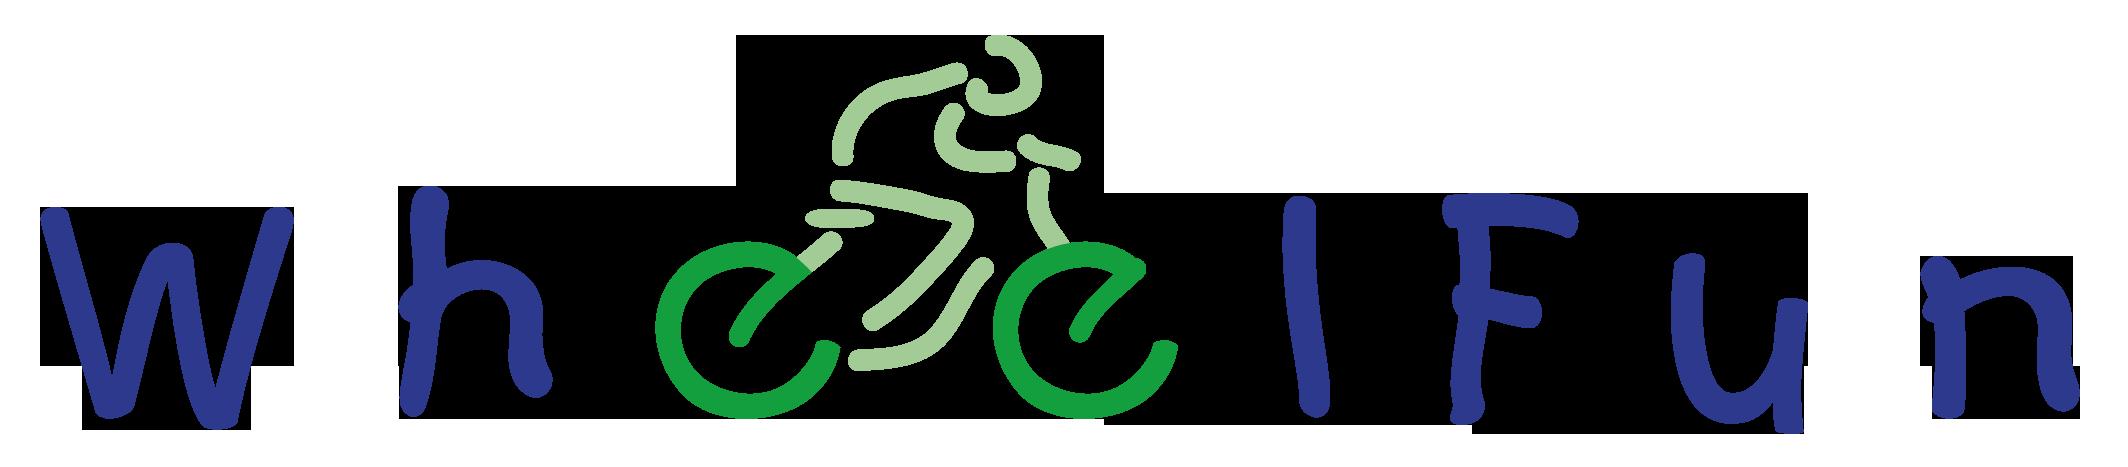 WheelFun-logo